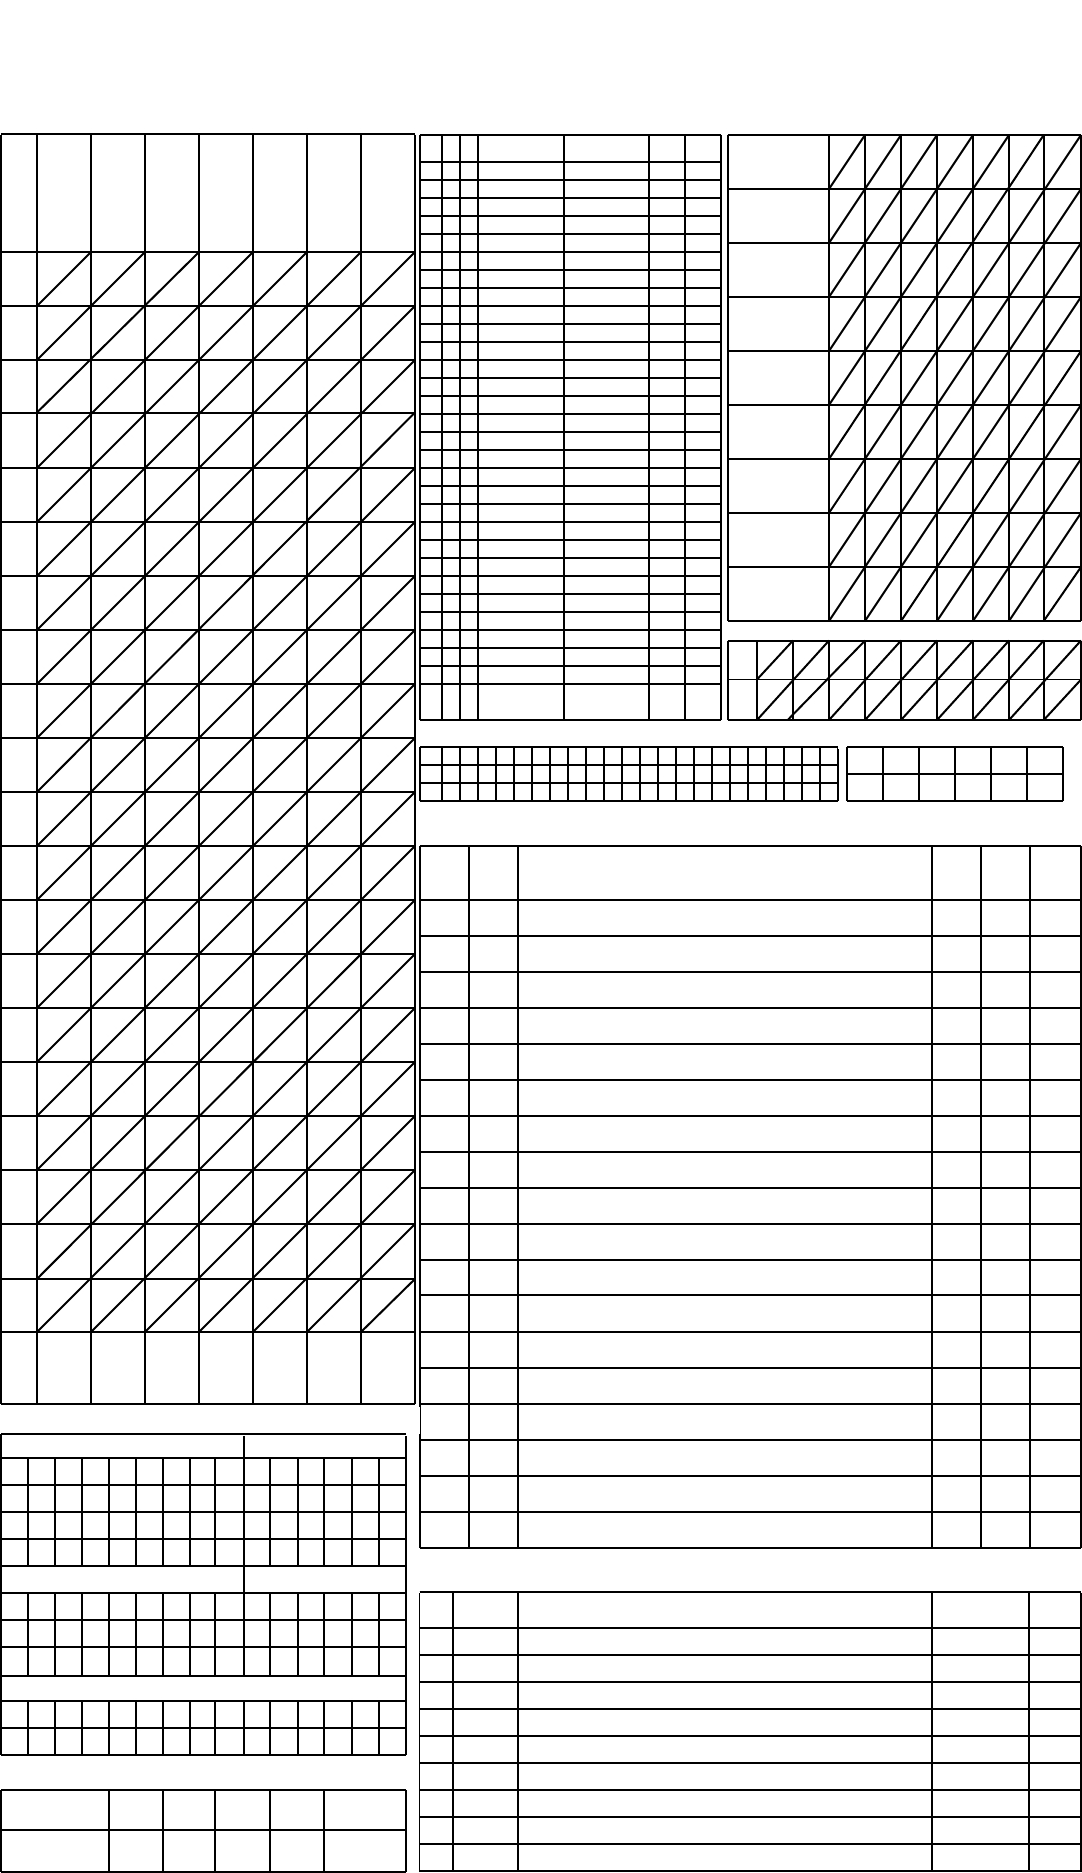 Softball Stats Spreadsheet   Laobing Kaisuo - Free Printable Softball Stat Sheets